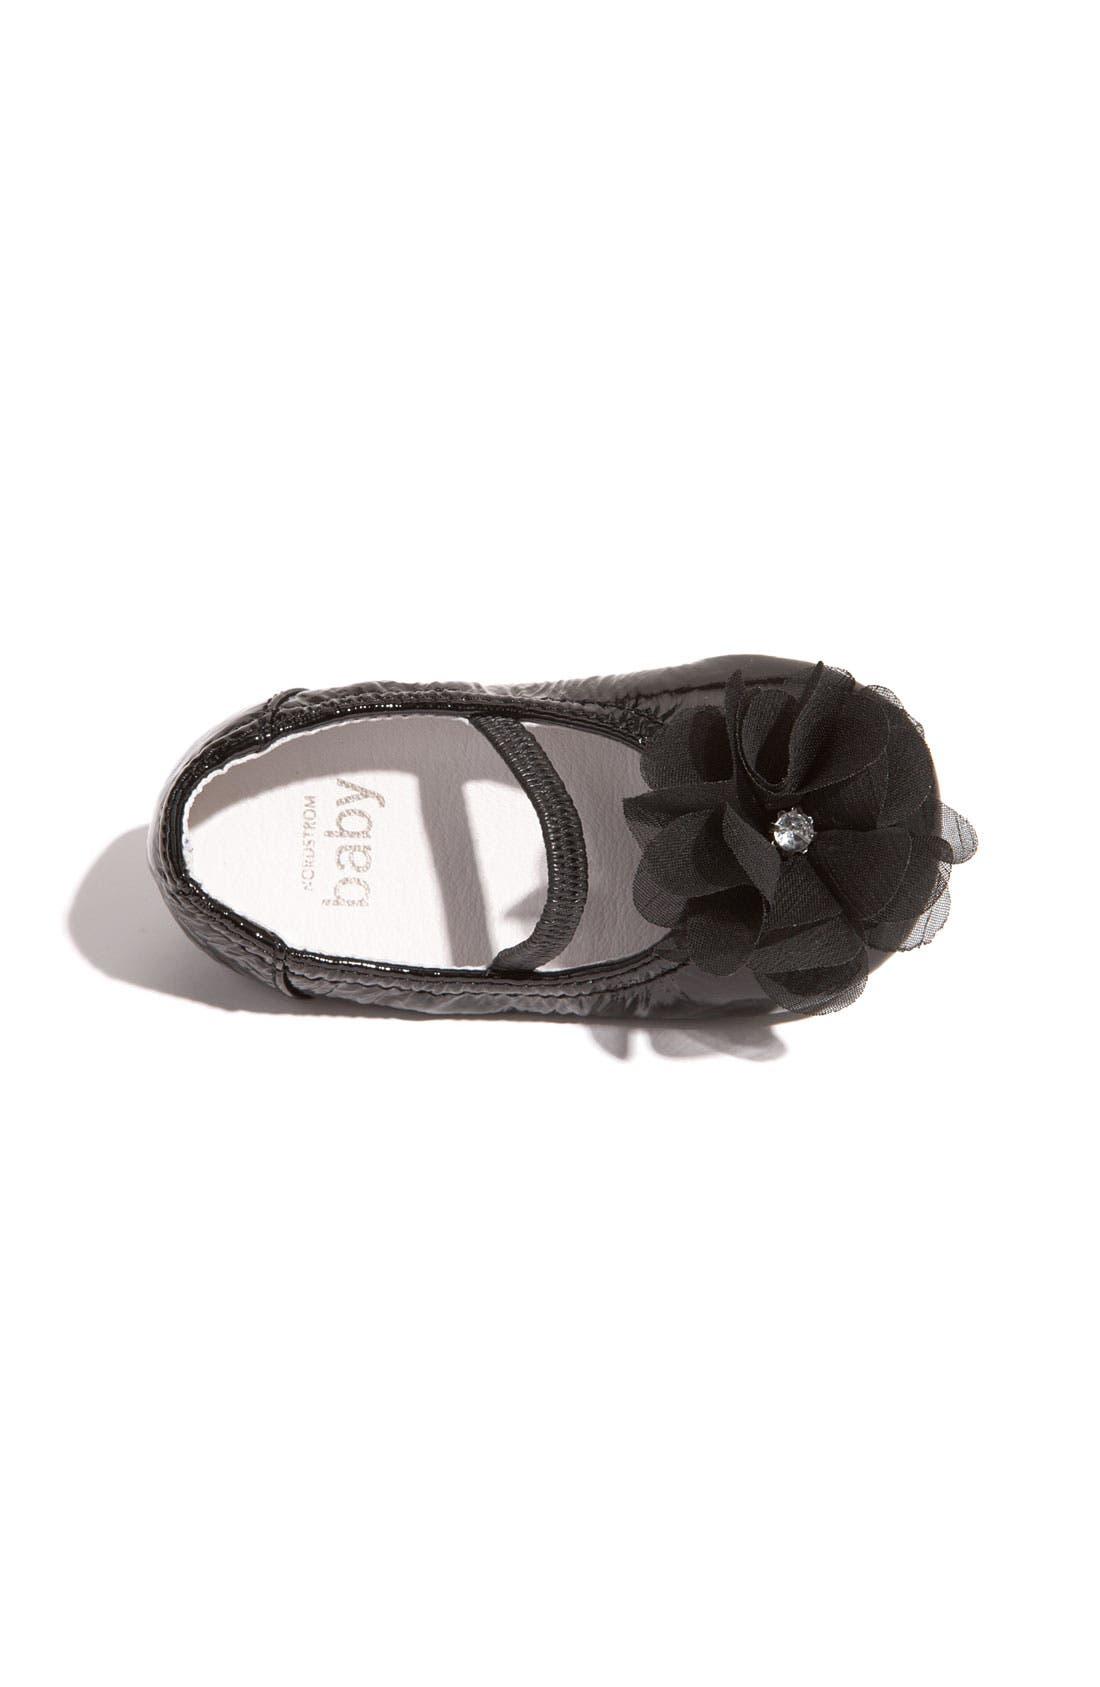 Alternate Image 3  - Nordstrom Baby 'Pretty' Dress Shoe (Infant)